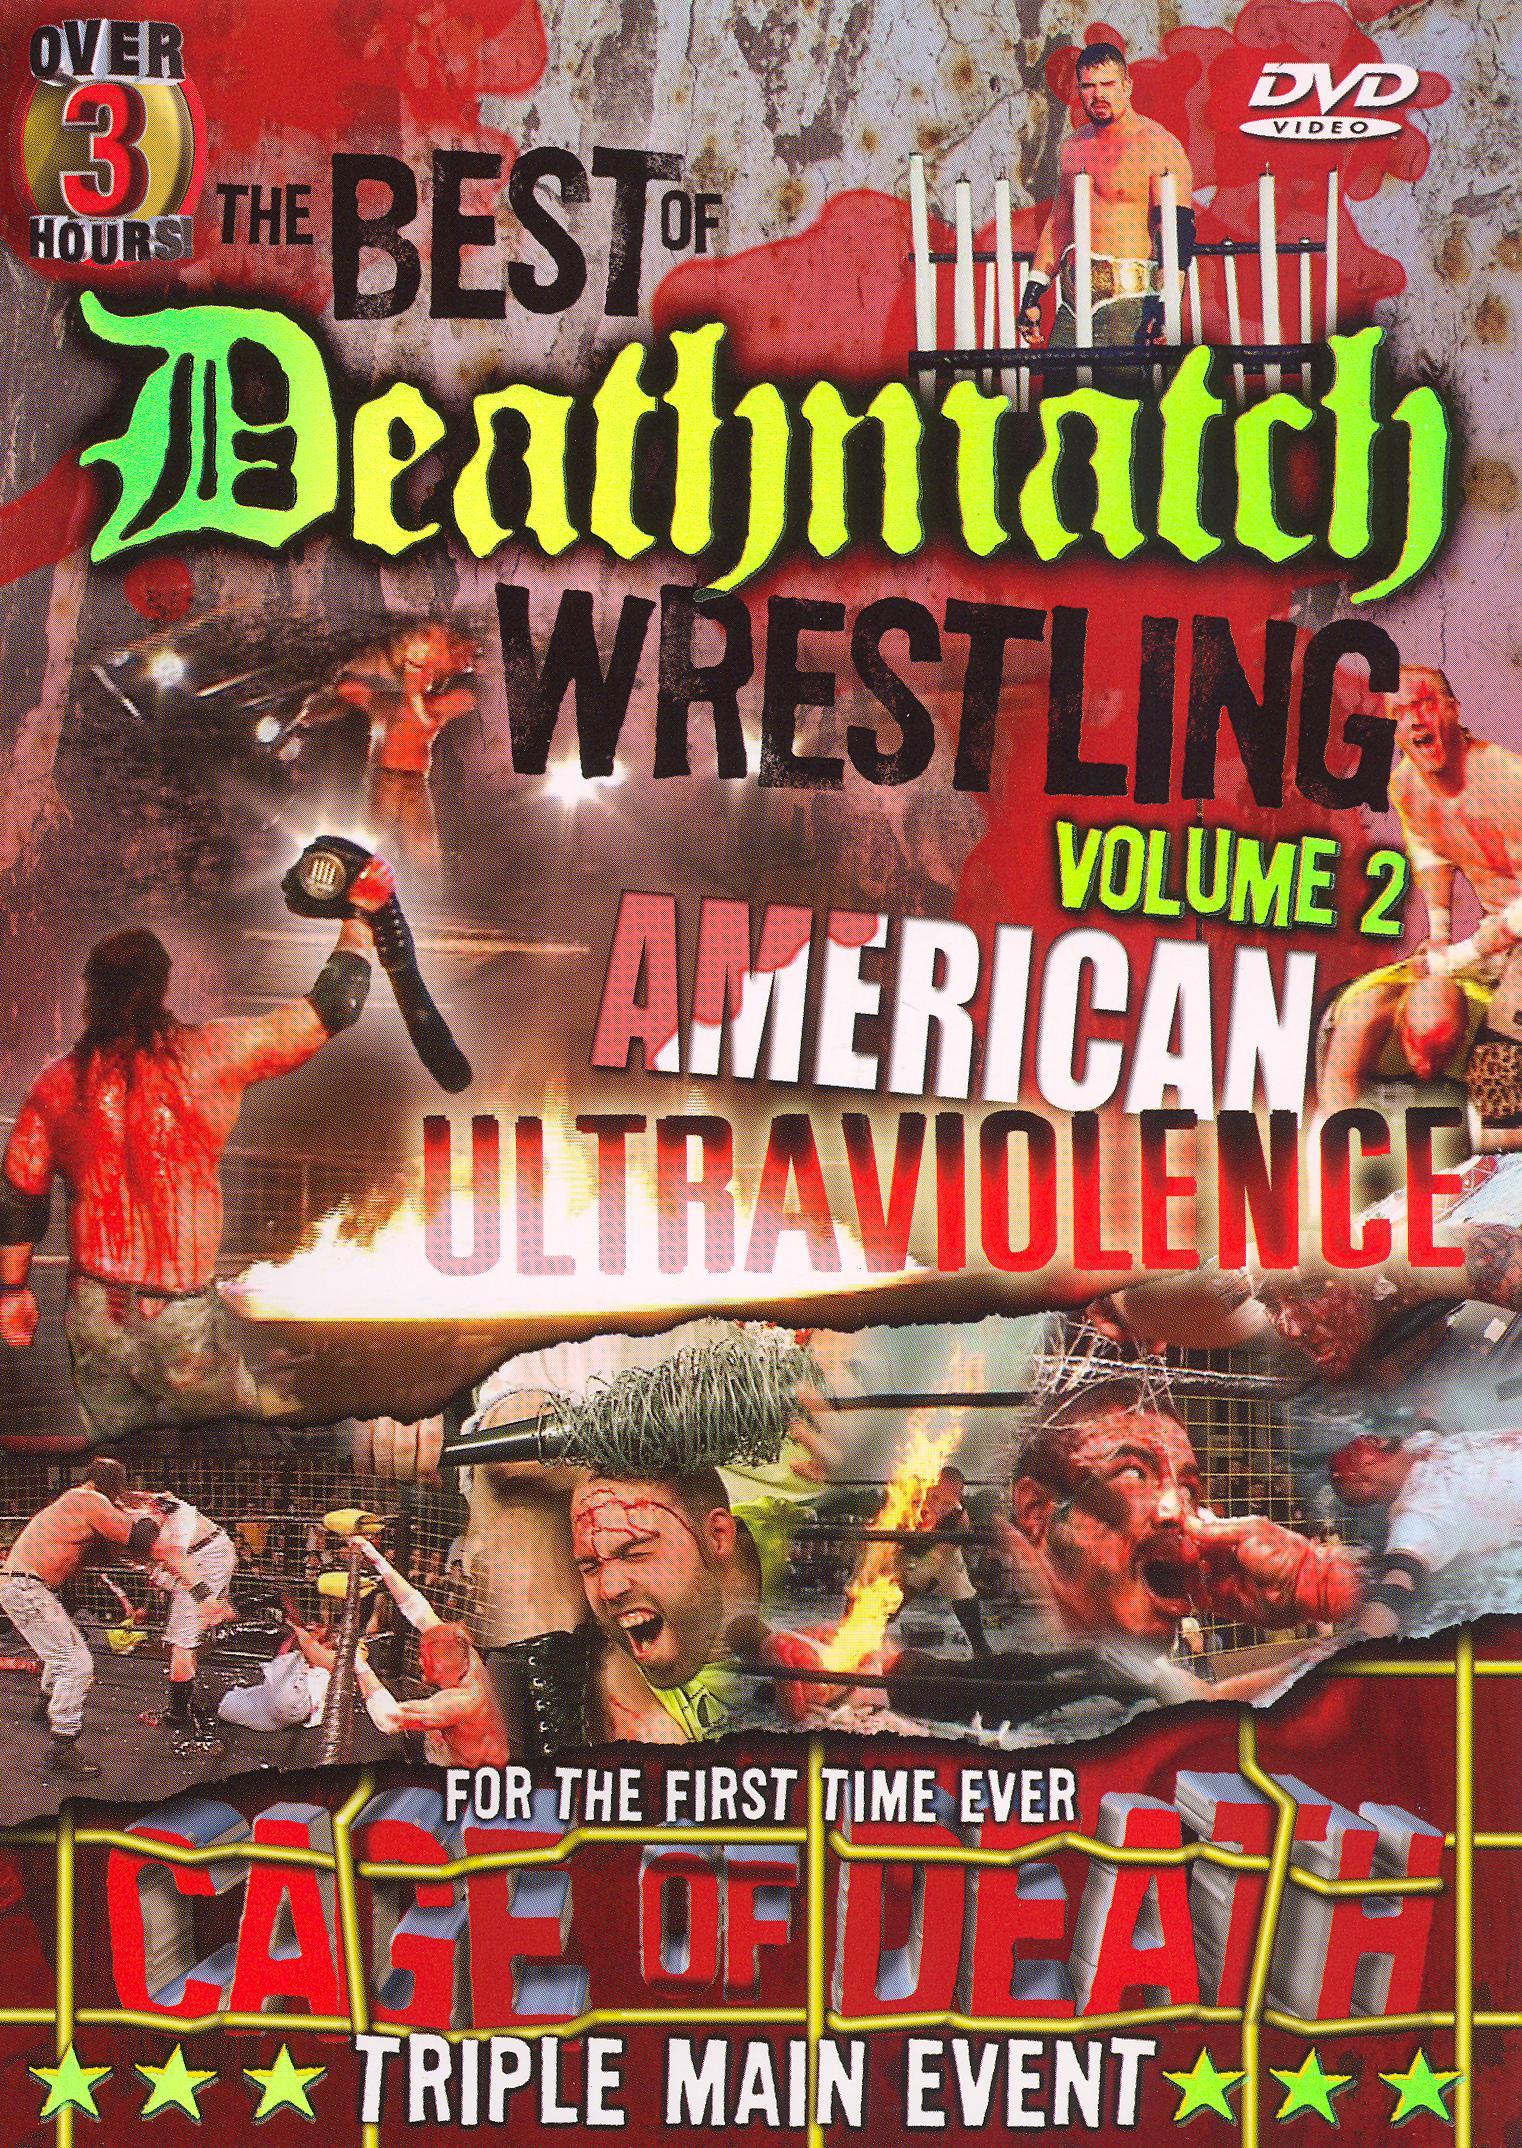 Best of Deathmatch Wrestling, Vol. 2: American Ultraviolence